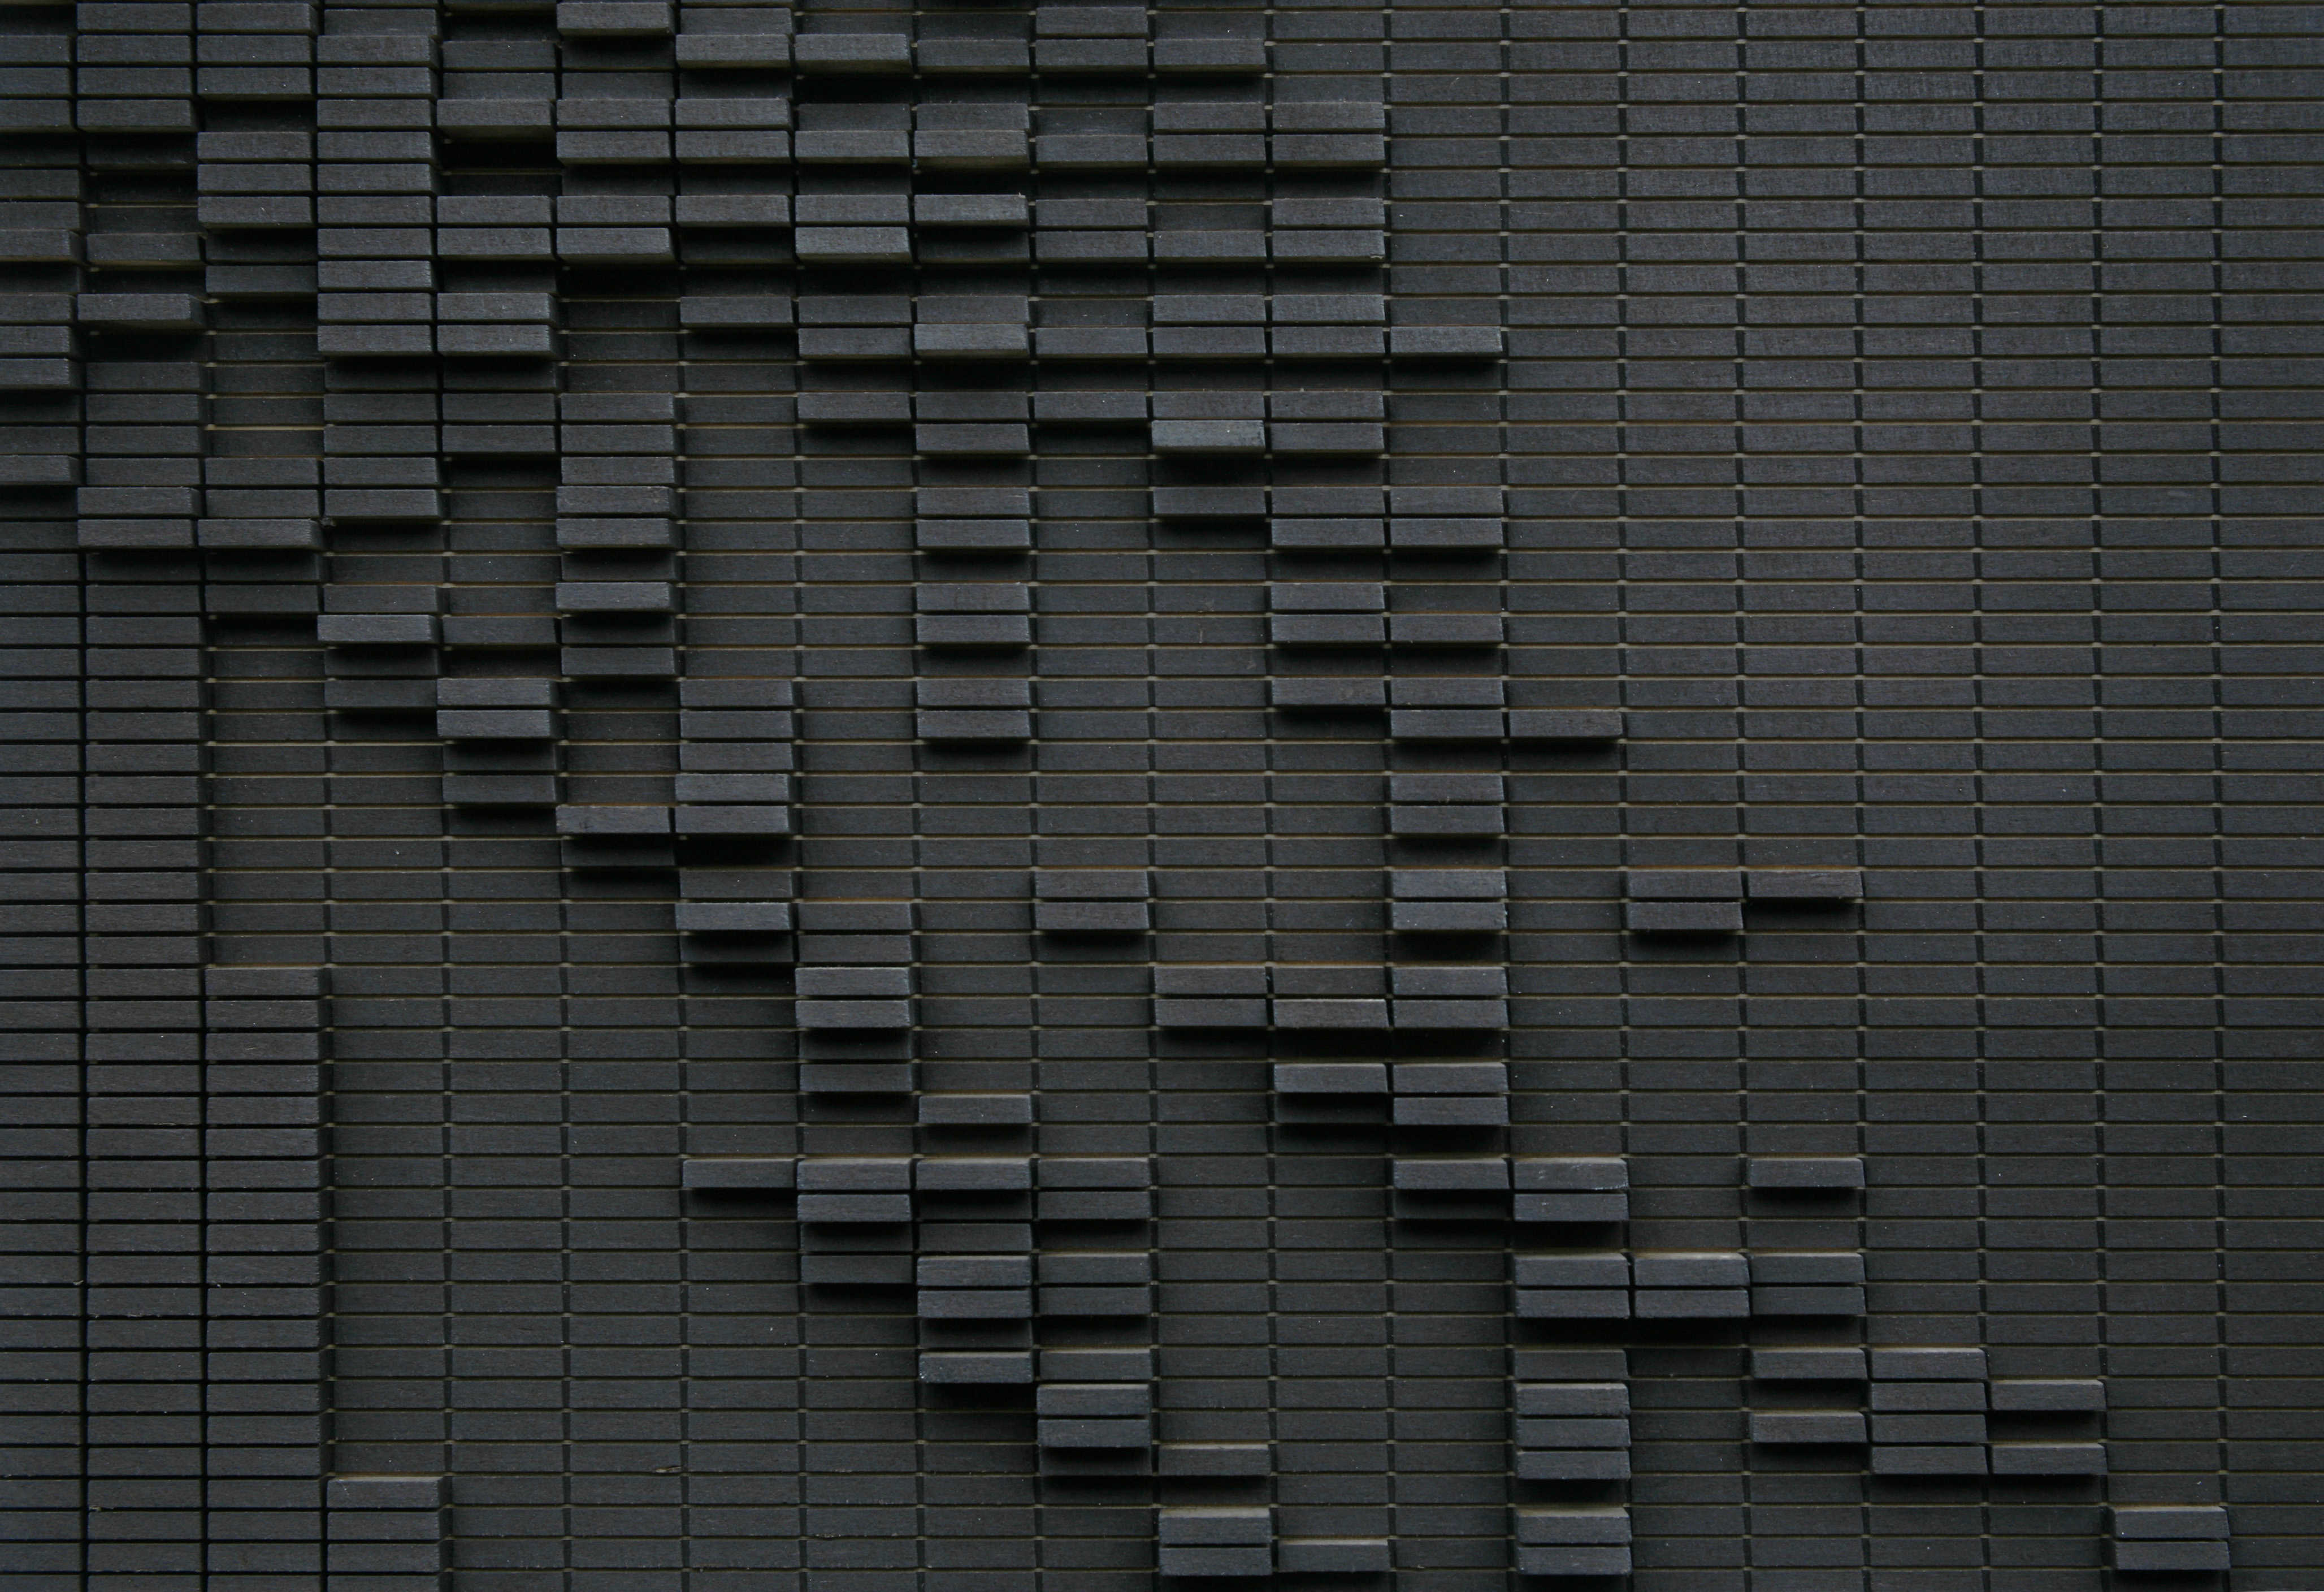 Parametric Design For Brick Surfaces Zwarts Amp Jansma